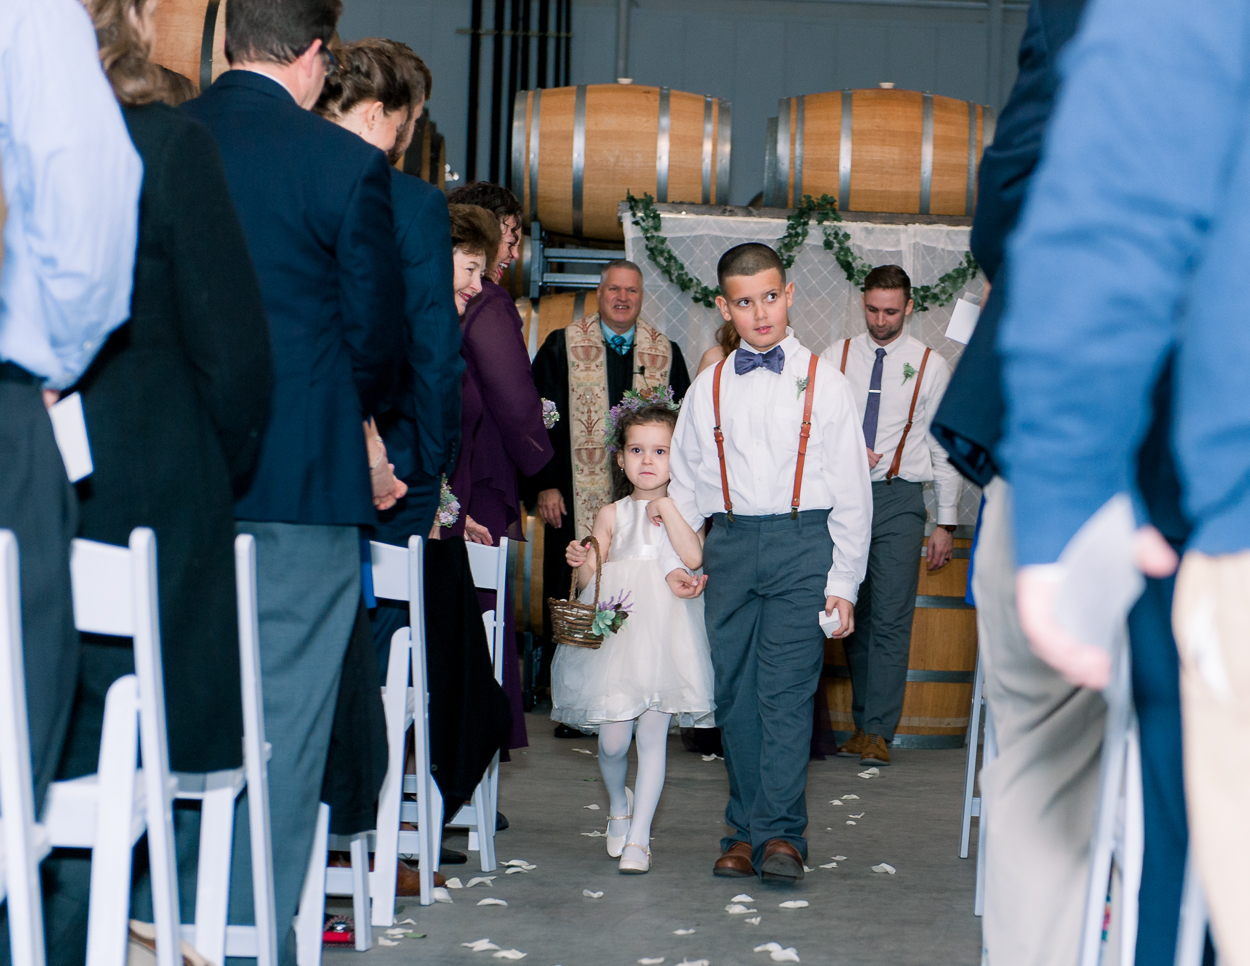 BigCork_vineyard wedding_virginiaweddingphotographer_youseephotography_SarahJames (15).JPG